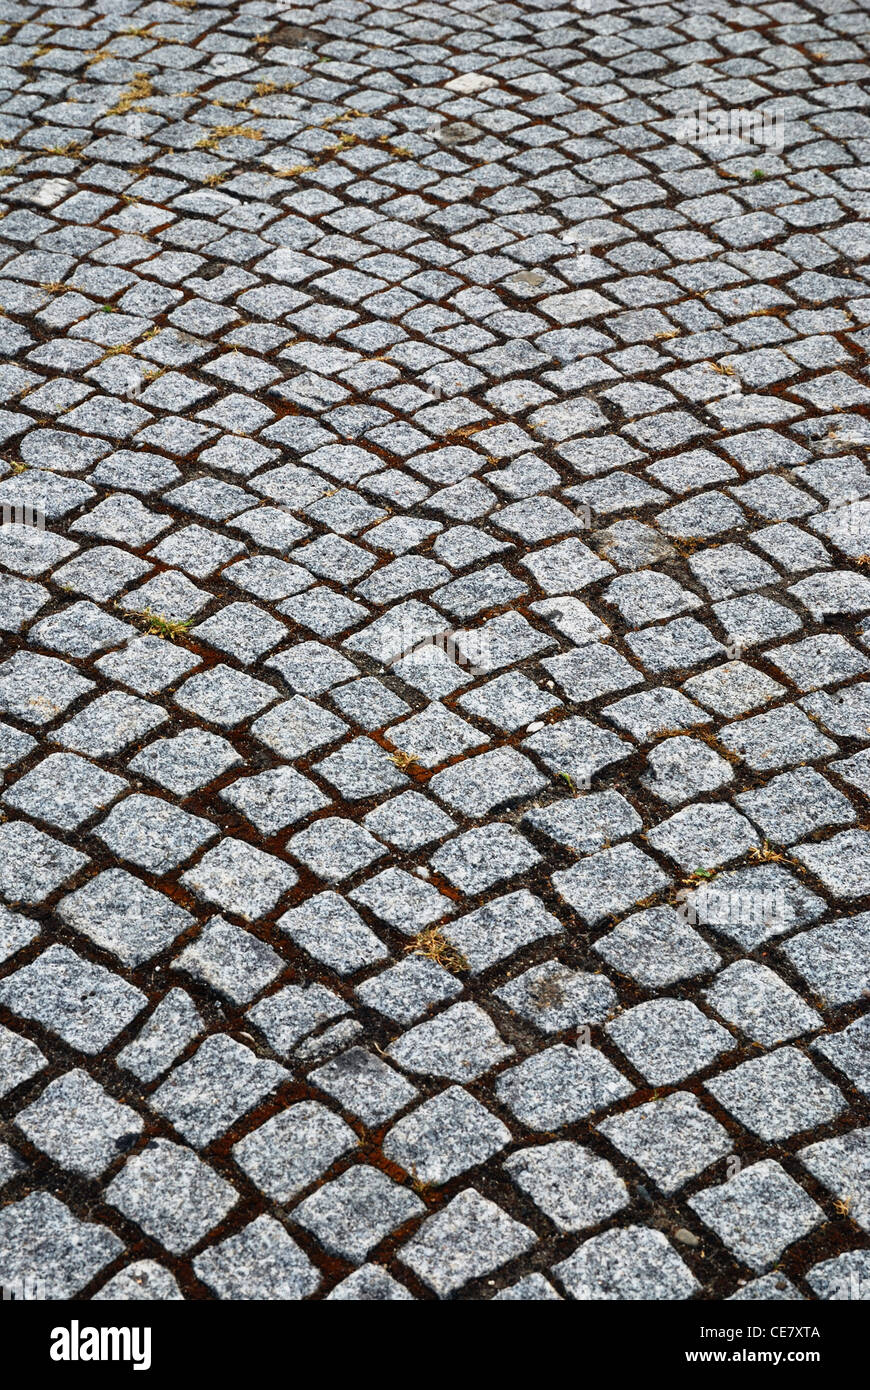 Granite stones of pitcher paving - Stock Image